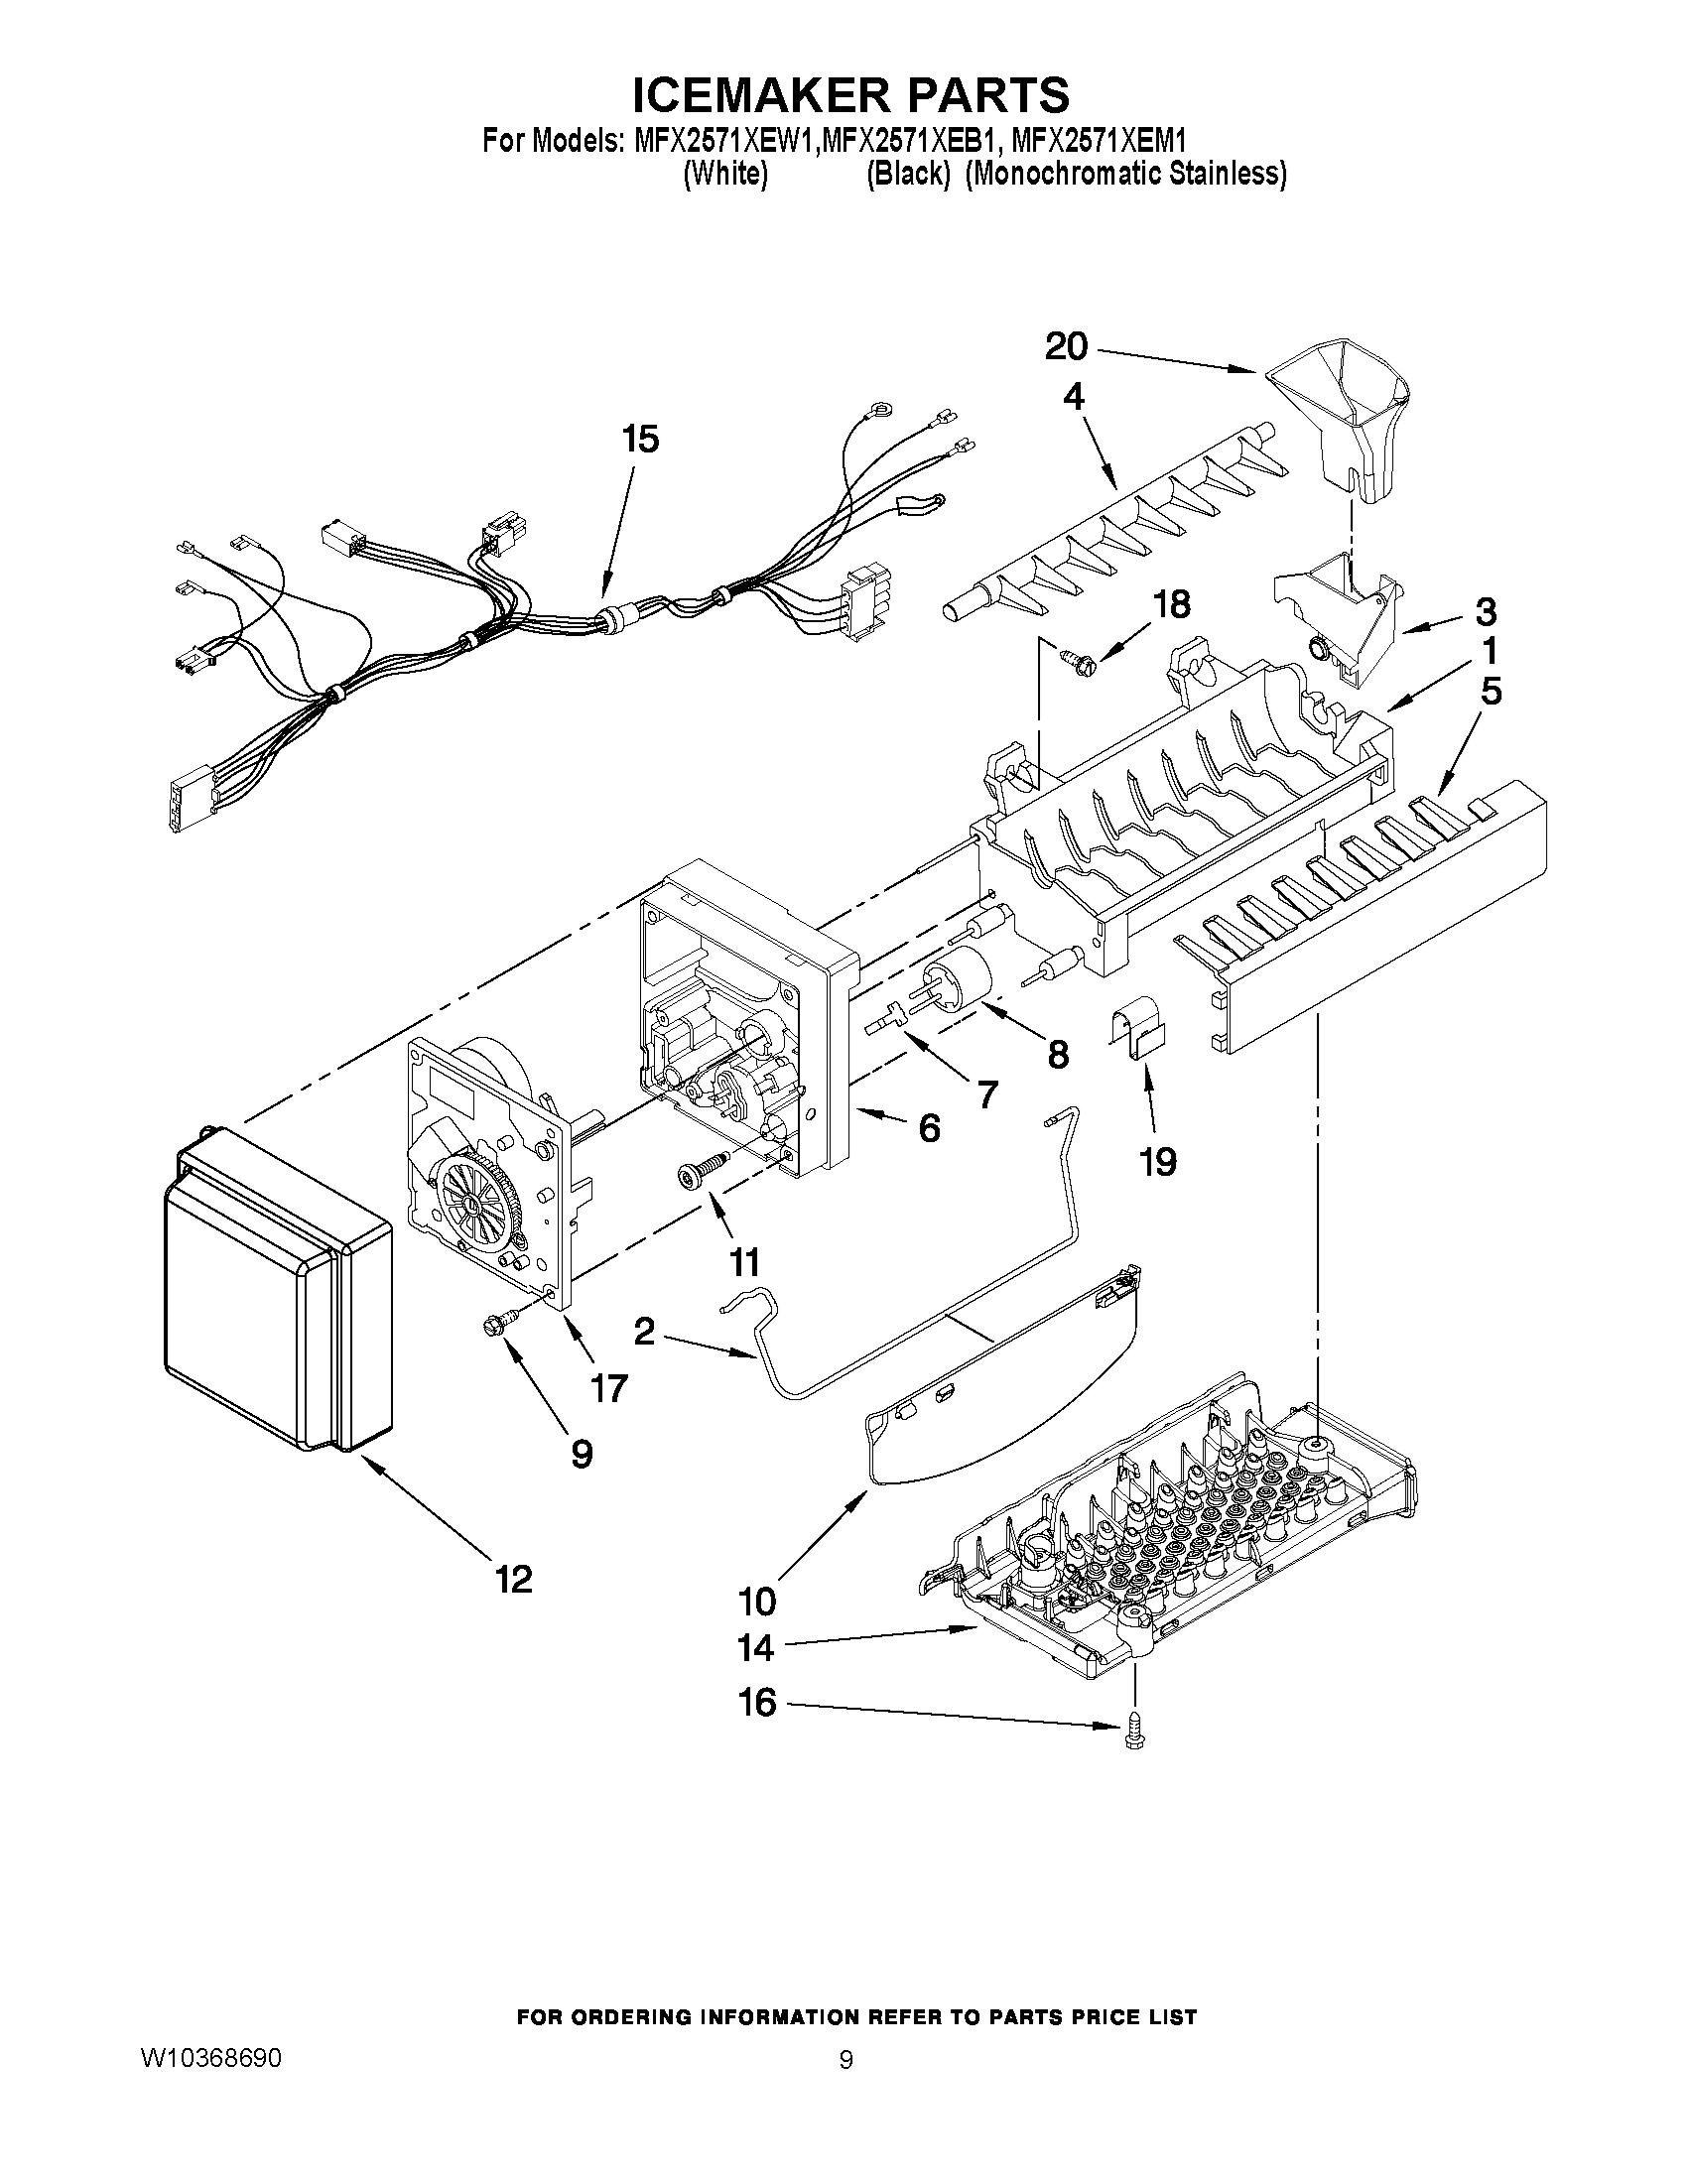 wiring diagram for kubota rtv x1100c